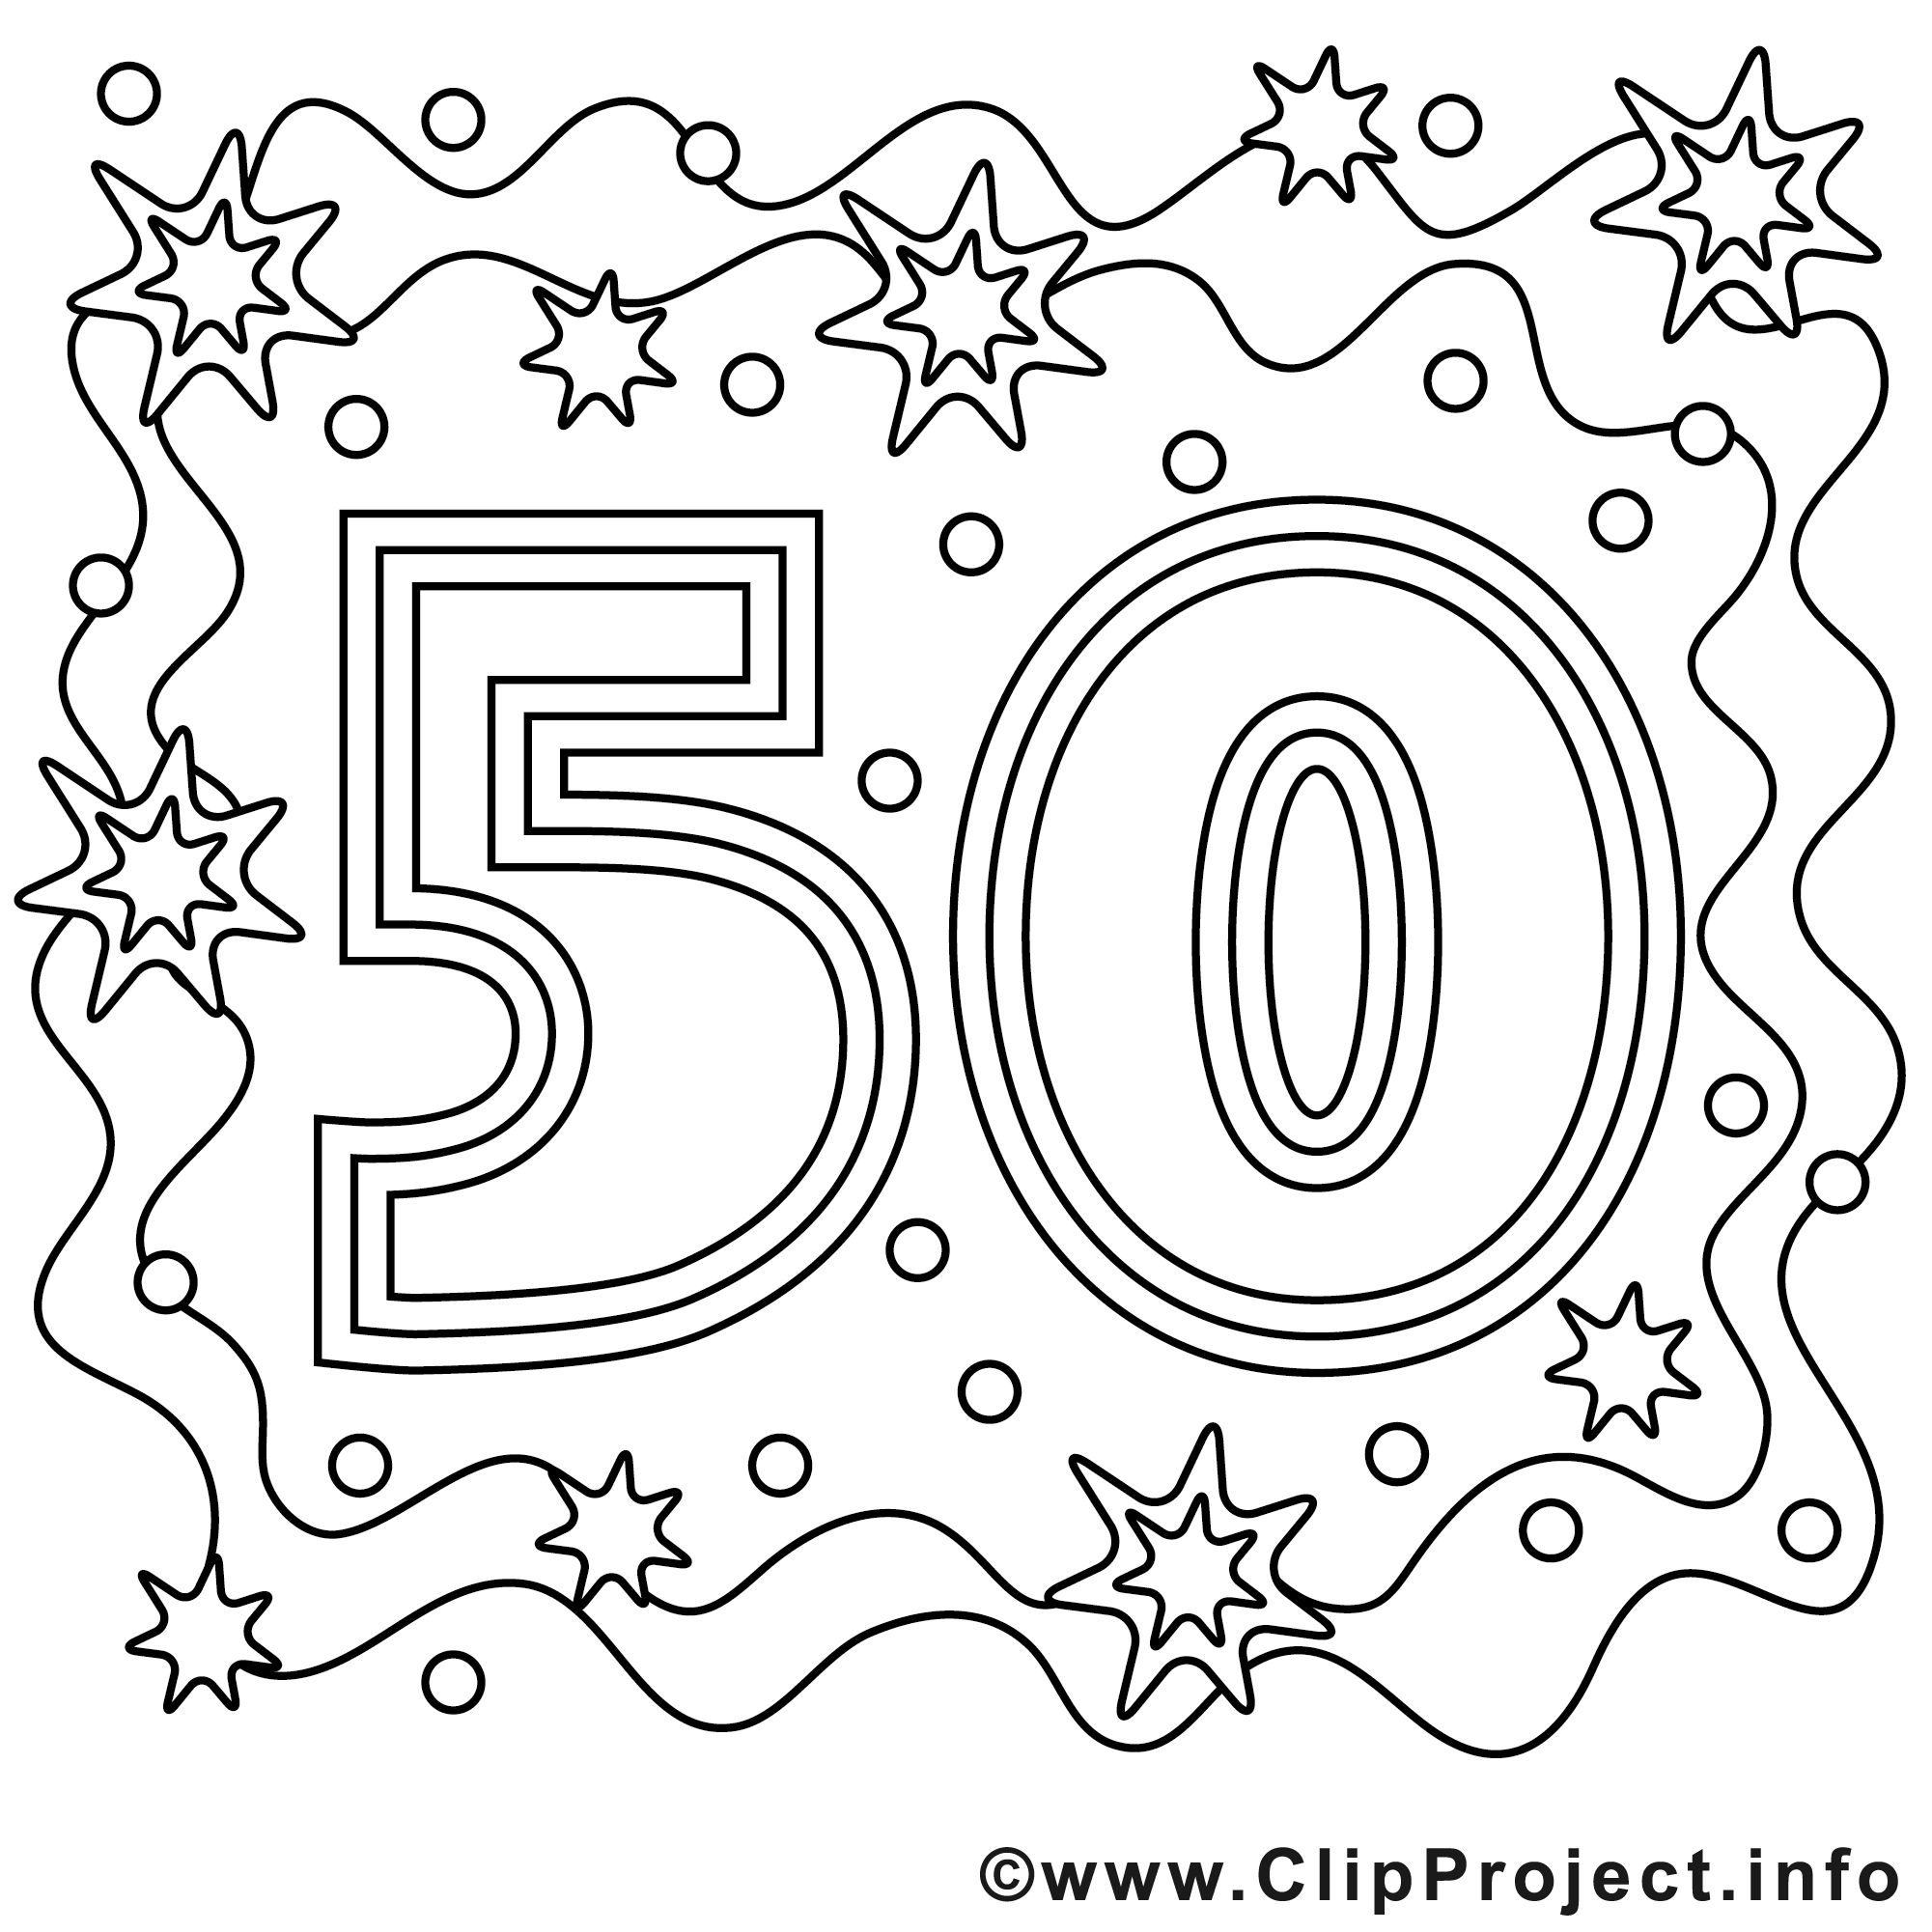 Ausmalbild zum 50 Geburtstag